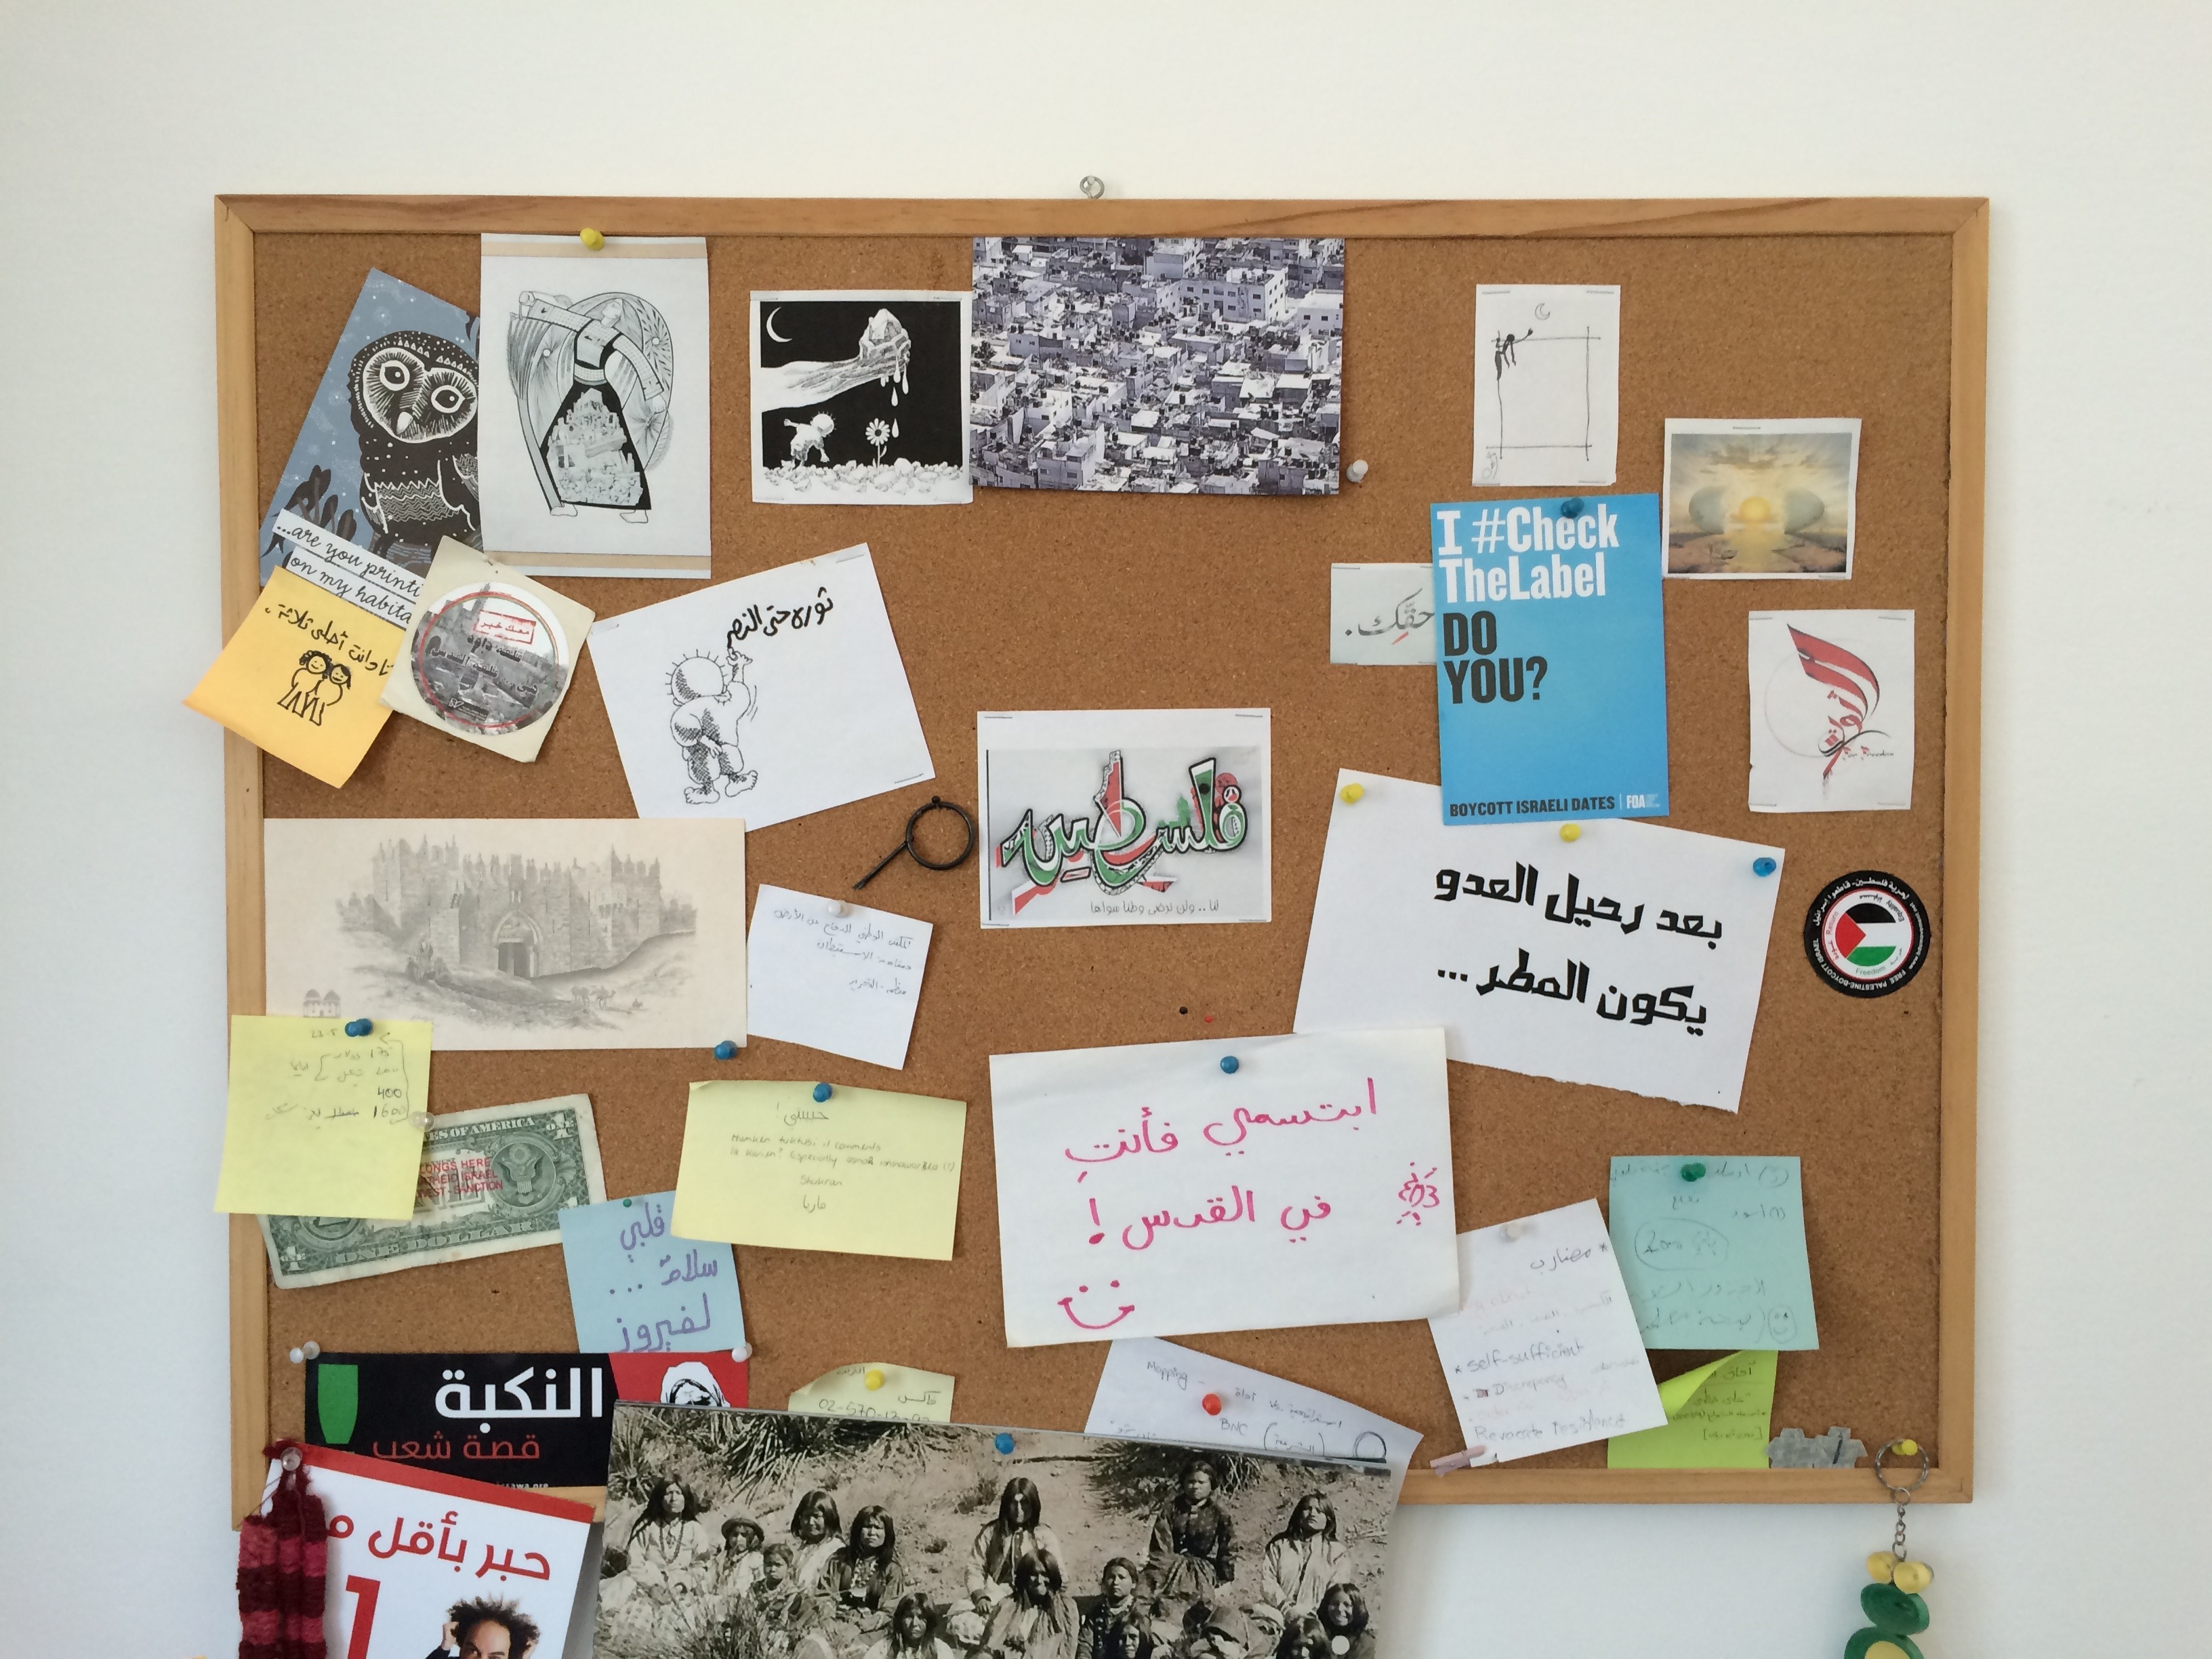 At the office of Grassroots Jerusalem. Photo: Anas Kababo